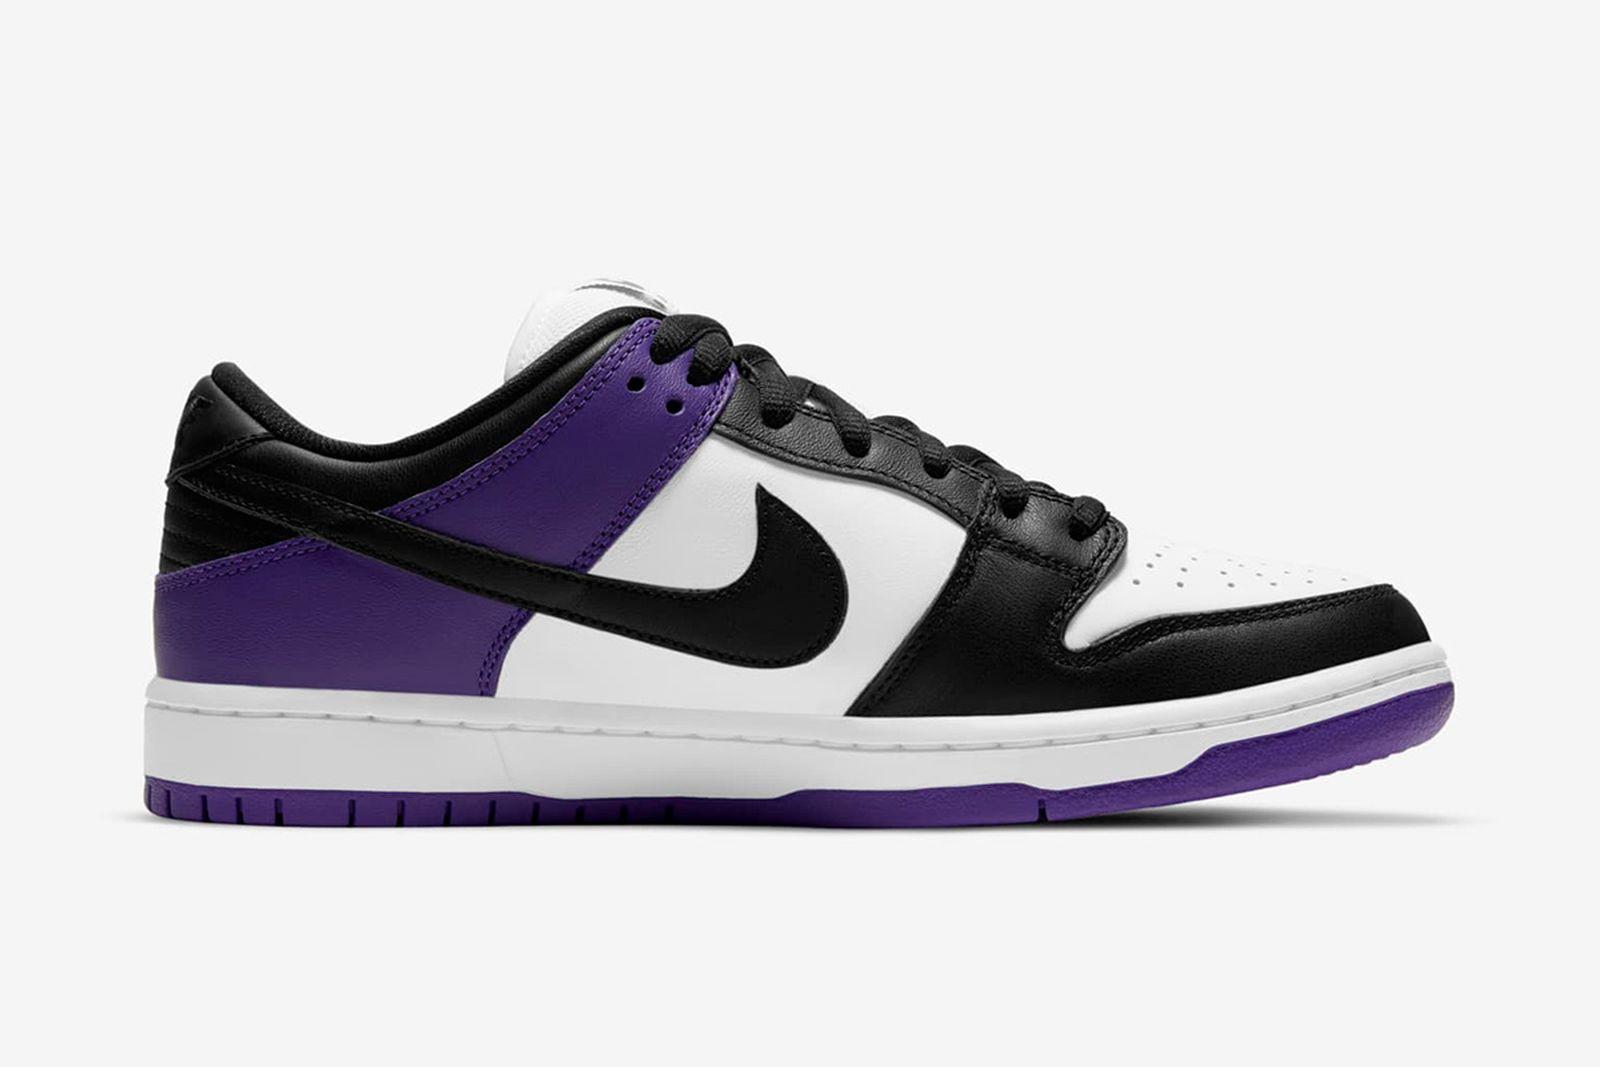 nike-sb-dunk-low-court-purple-release-date-price-02